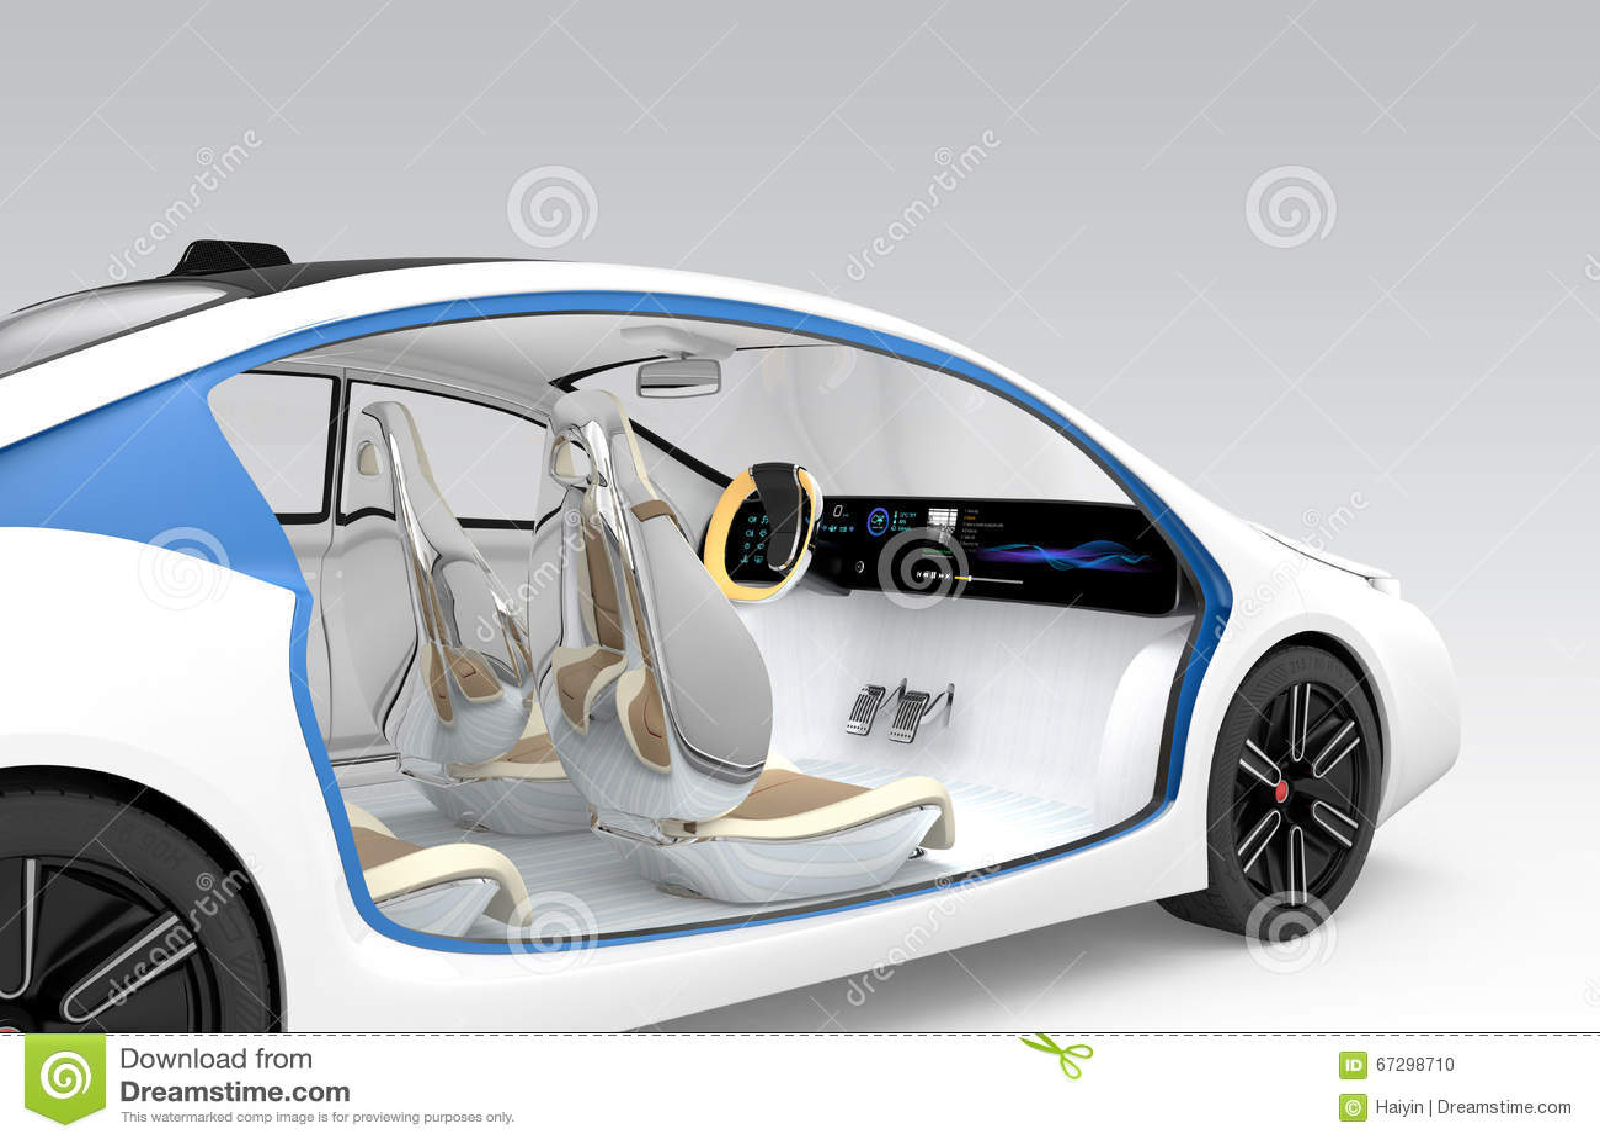 Autonomous Cars Interior Concept The Car Offer Folding